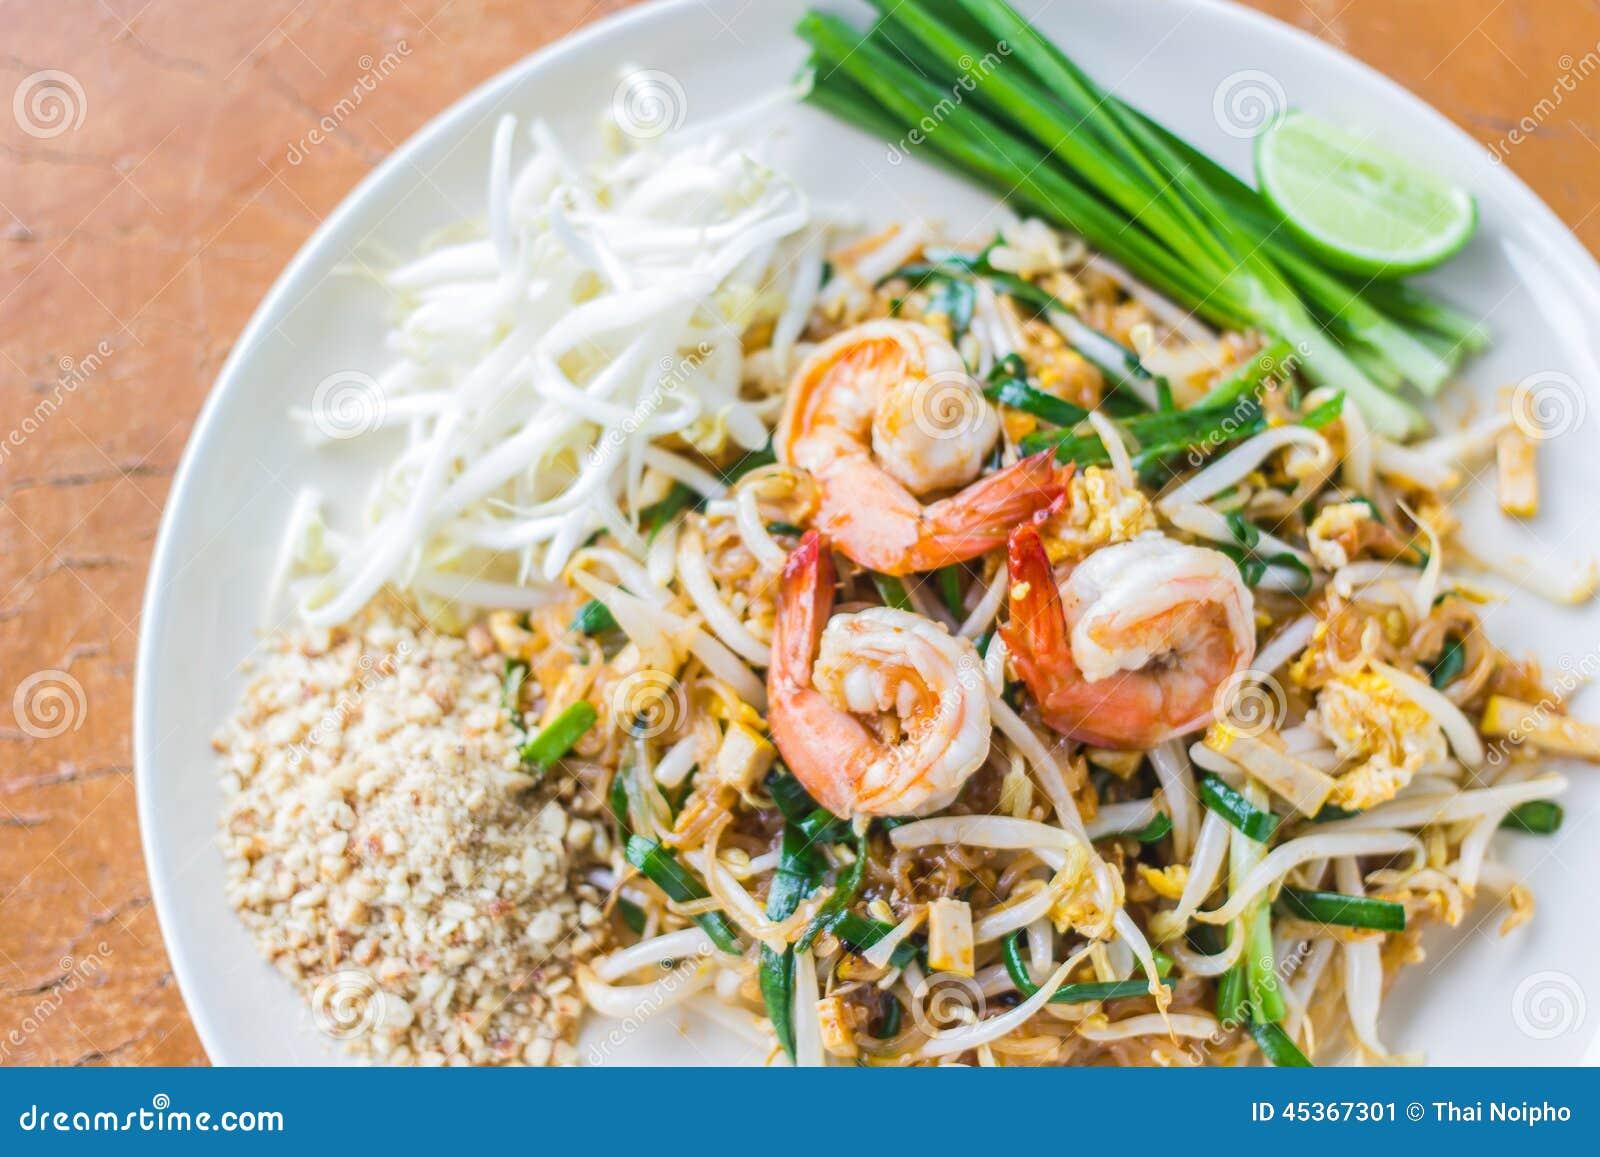 Download Thai Food Pad Thai , Stir Fry Noodles With Shrimp Stock Image - Image of fresh, quick: 45367301